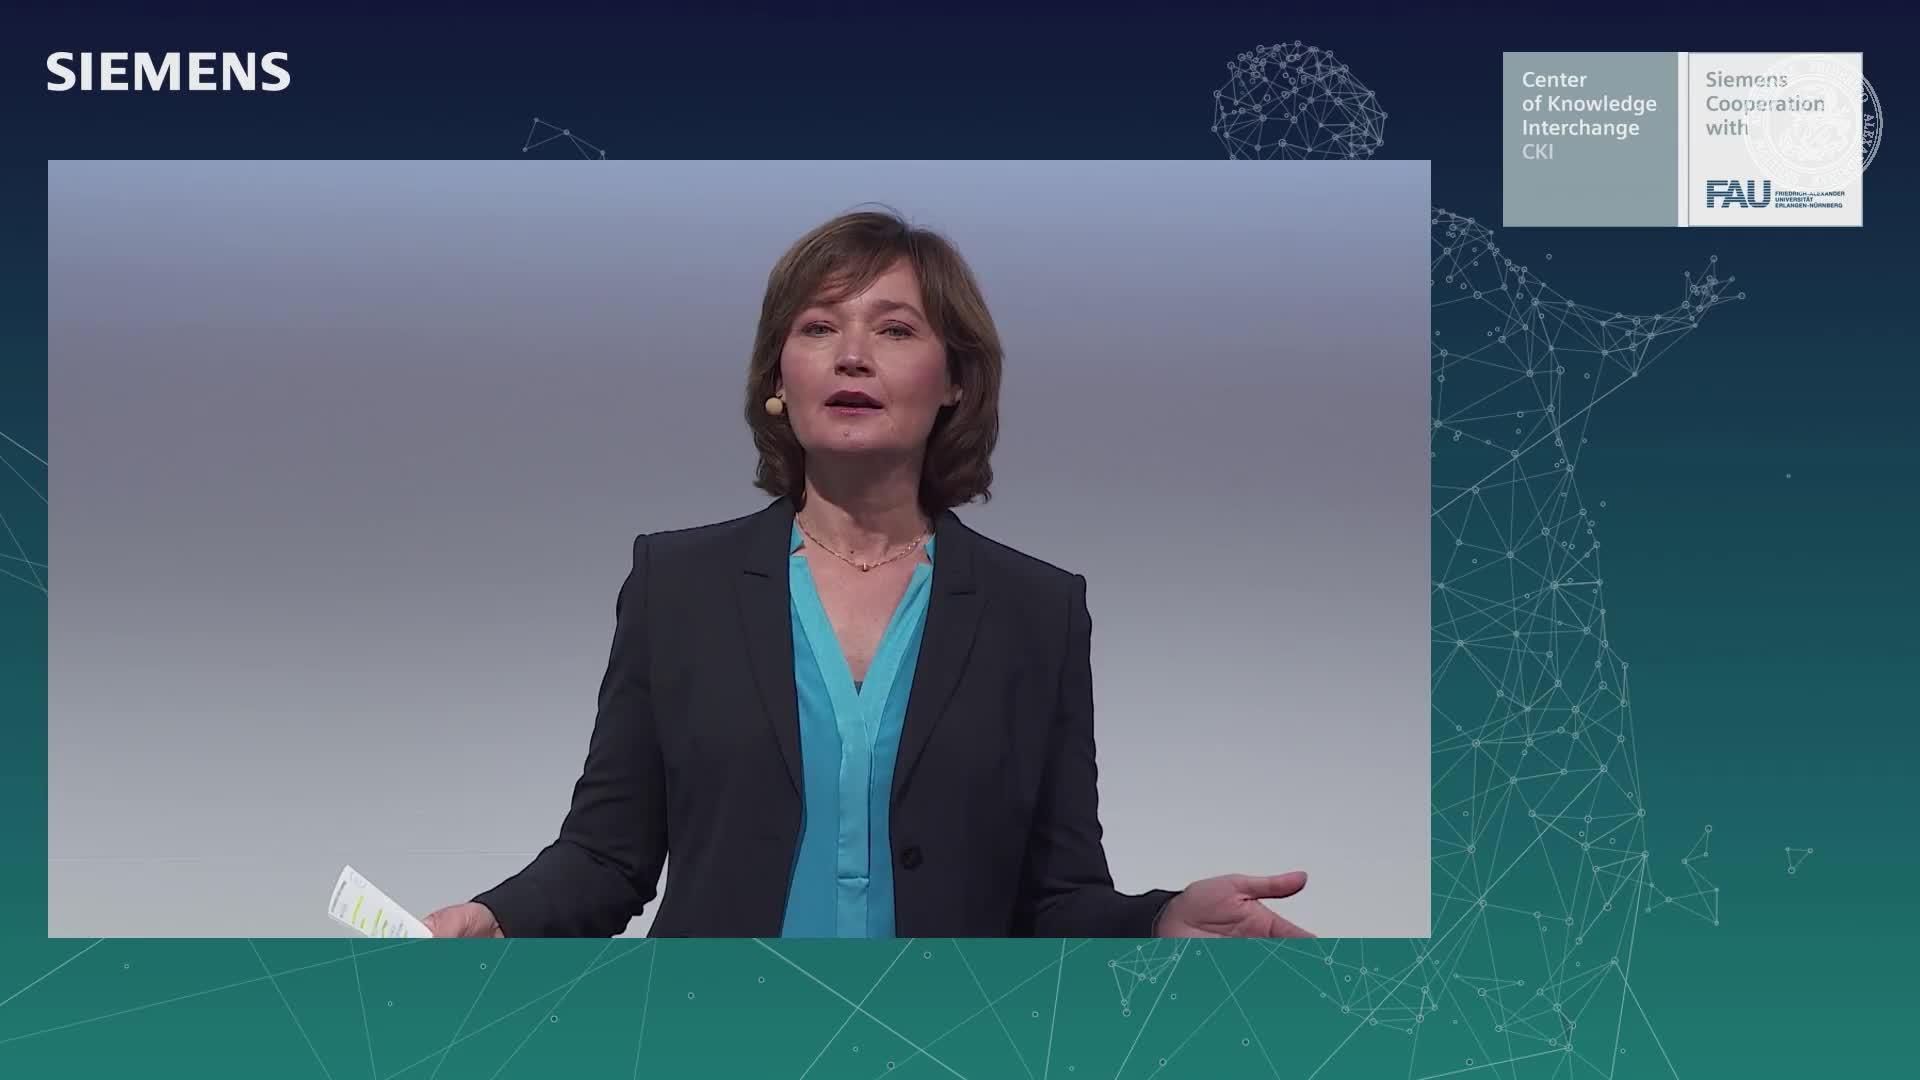 Hybrid CKI Conference - Future Talk: Digital Disruption – Impact on Knowledge Interchange preview image